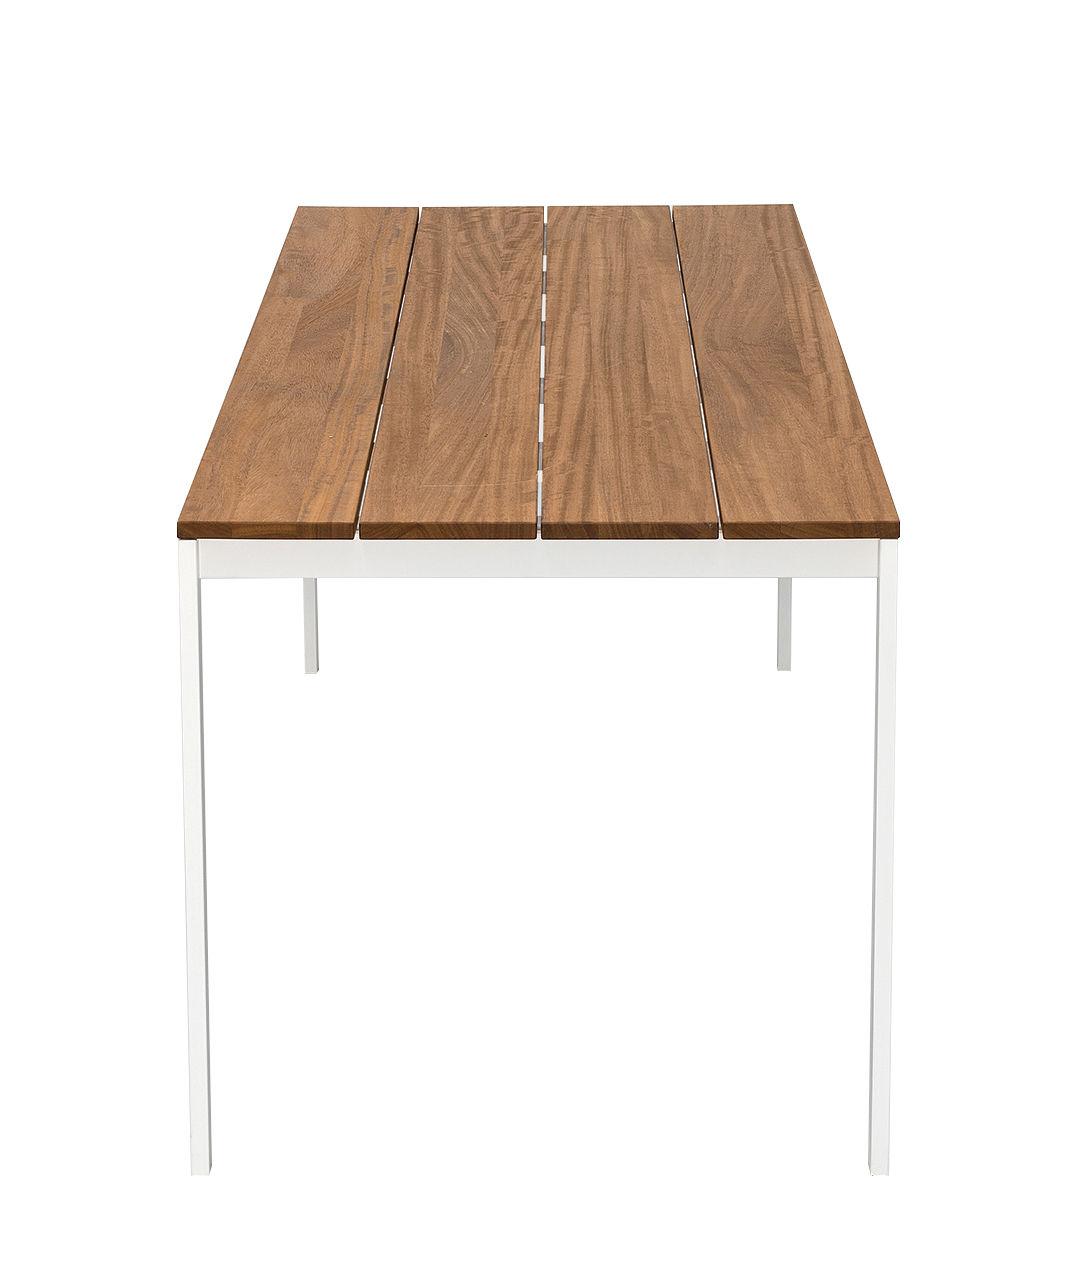 Outdoor - Tische - be-Easy rechteckiger Tisch / Teakholz - 200 x 79 cm - Kristalia - Teakholz / lackierter Stahl - lackierter Stahl, Teakholz